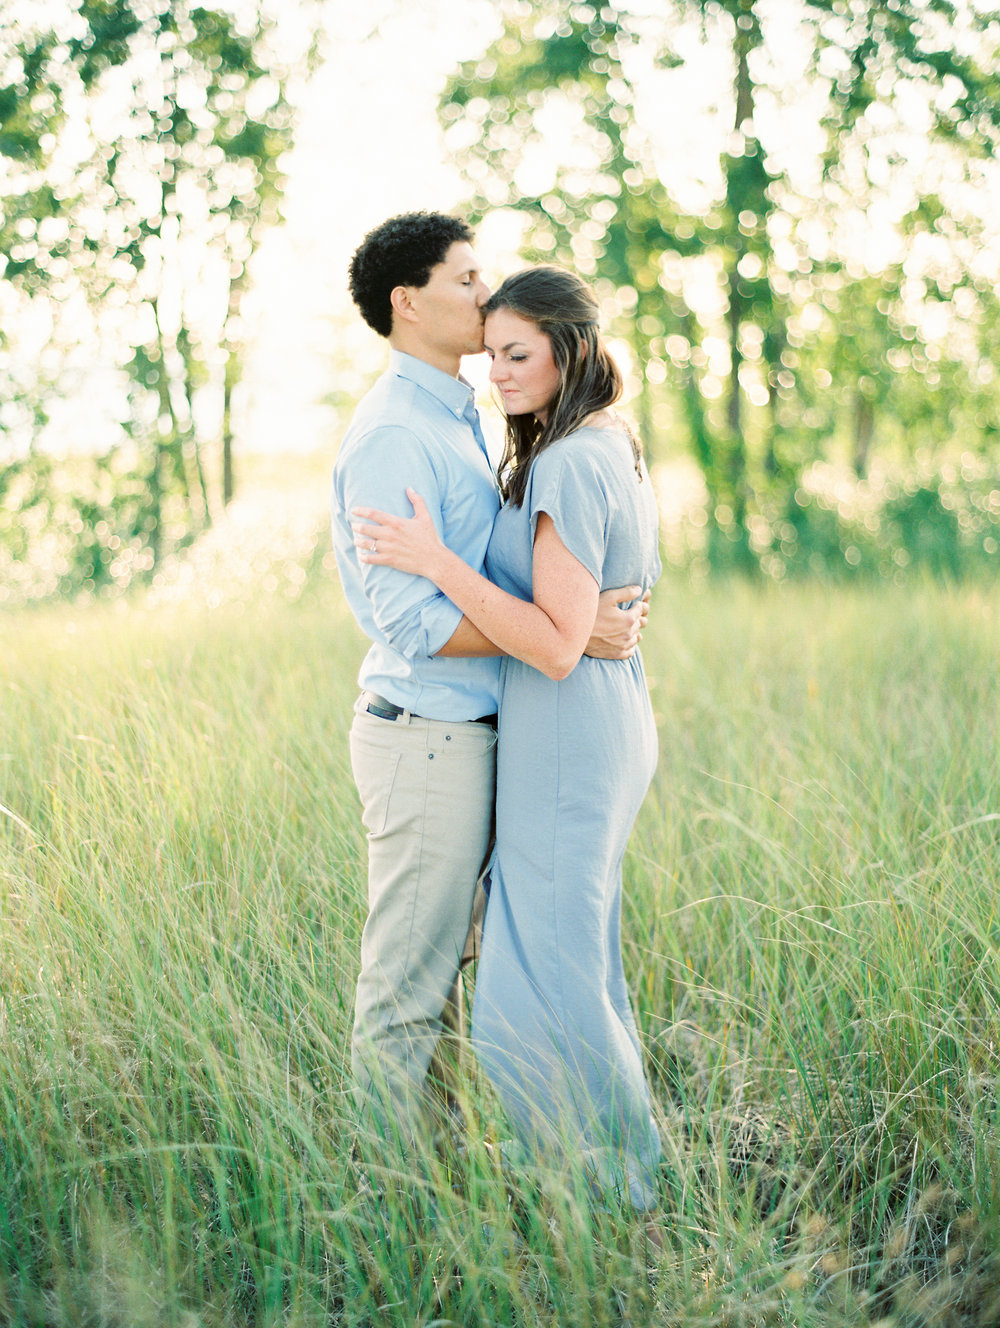 Lucie+Anthony+Engaged-104.jpg